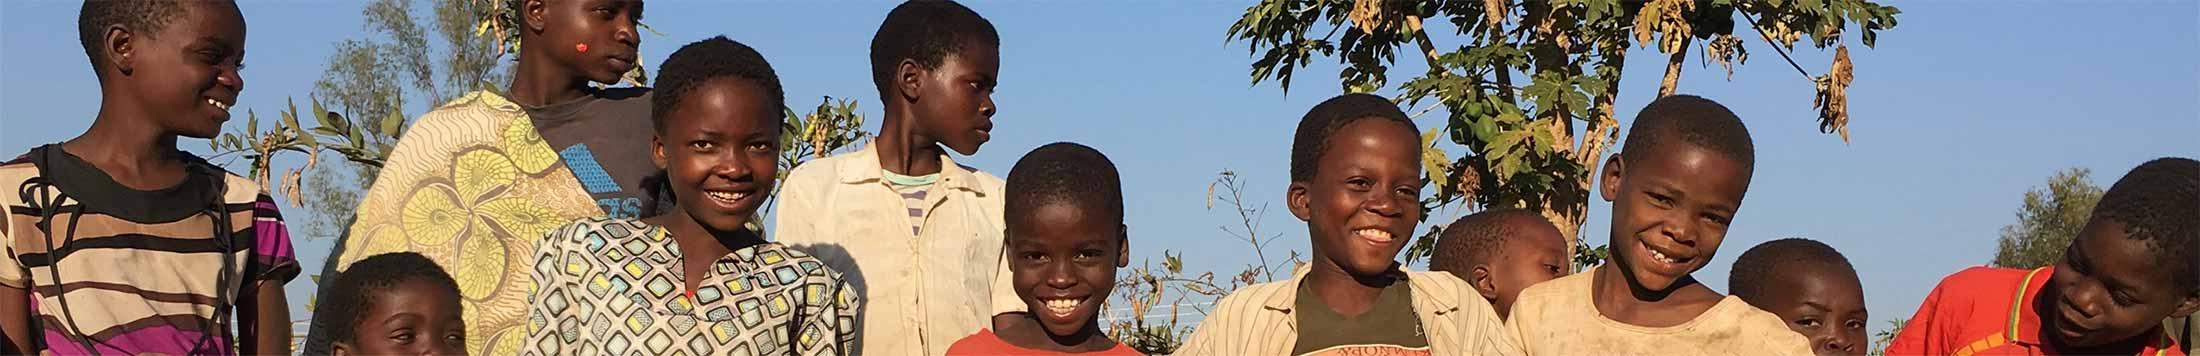 Sierra Leone - Unsere Hilfe